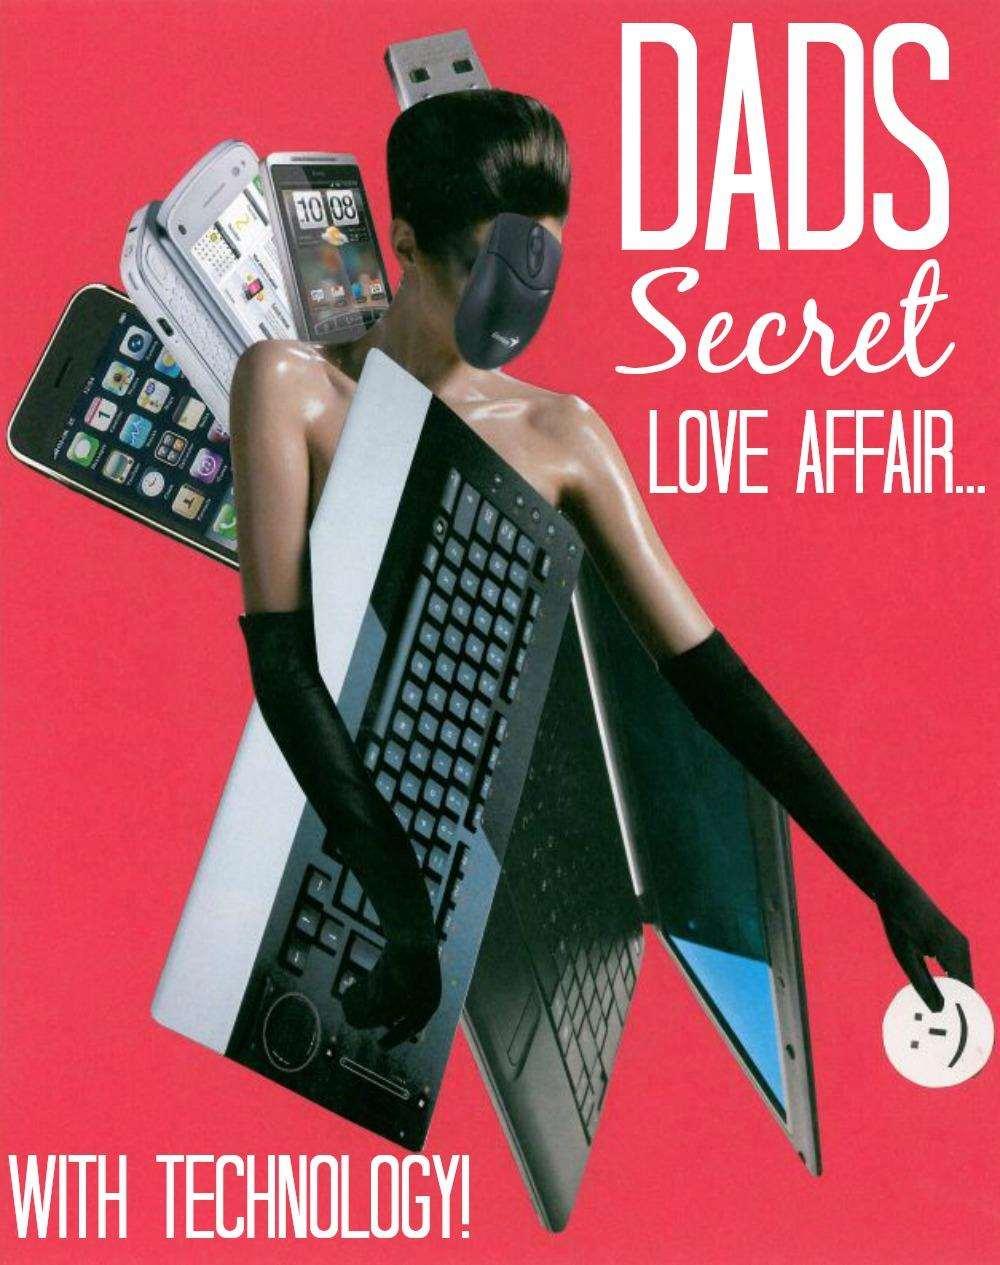 Dad's Secret love affair…. with technology, Miss Gadget%, uncategorised%